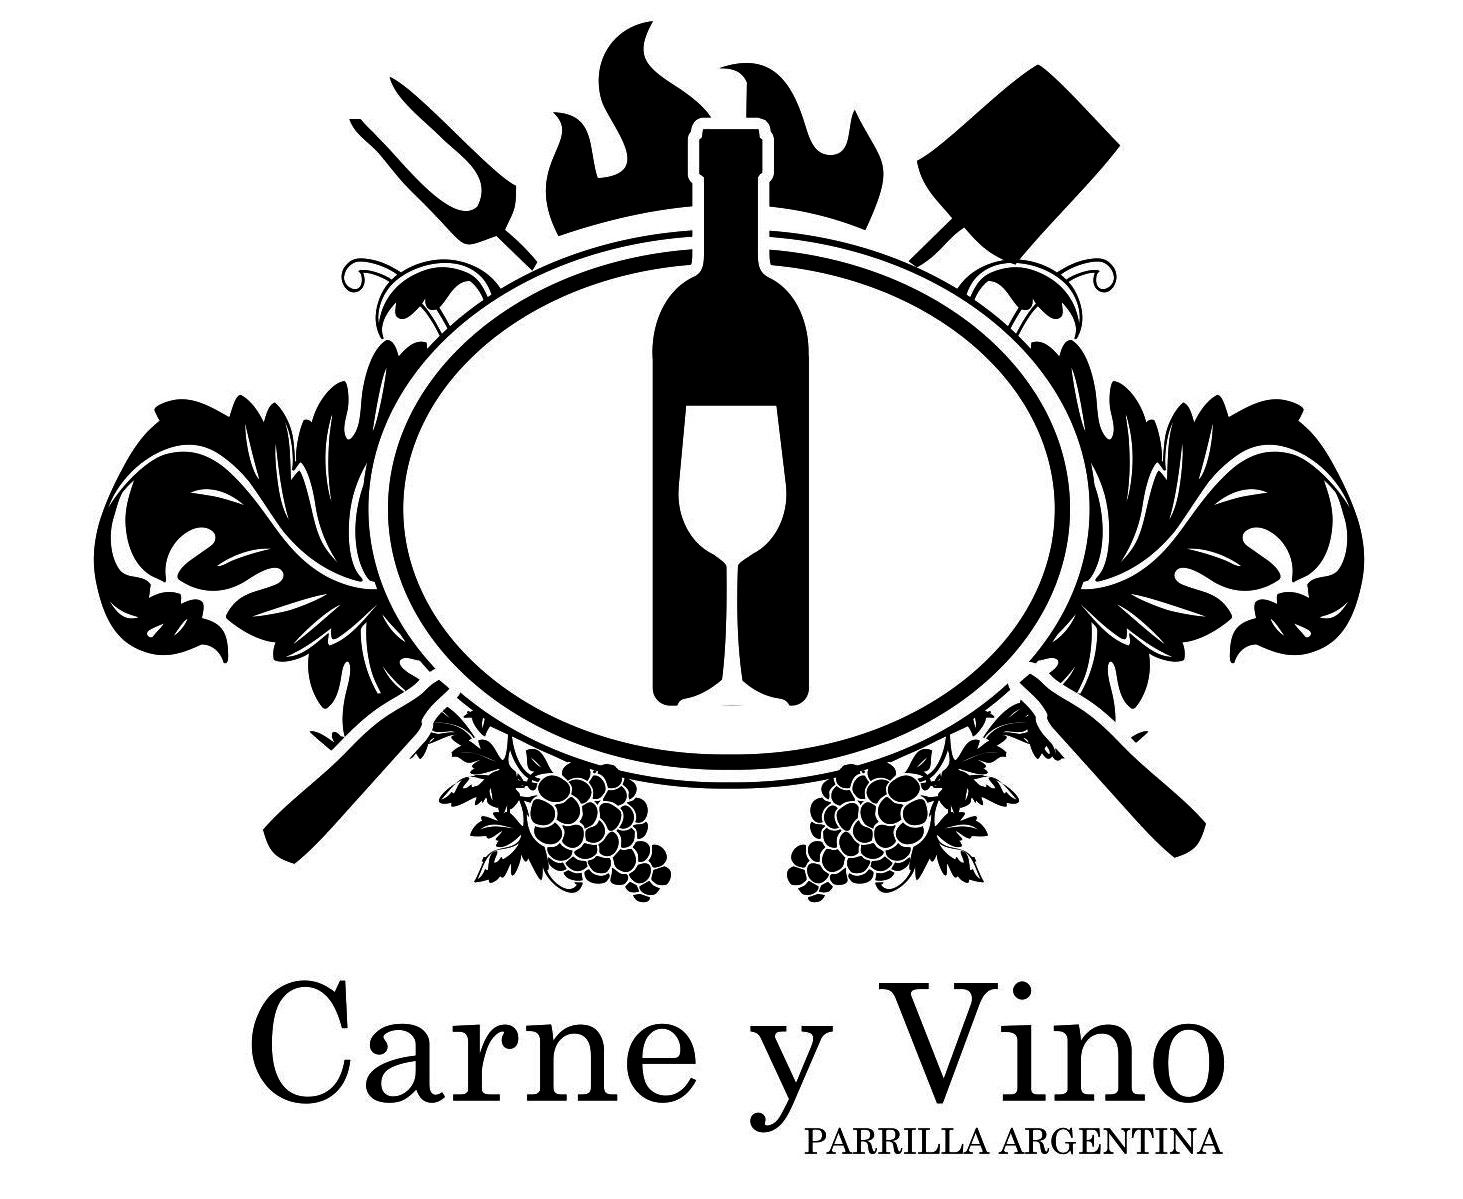 LOGO CARNE Y VINO 2.jpg